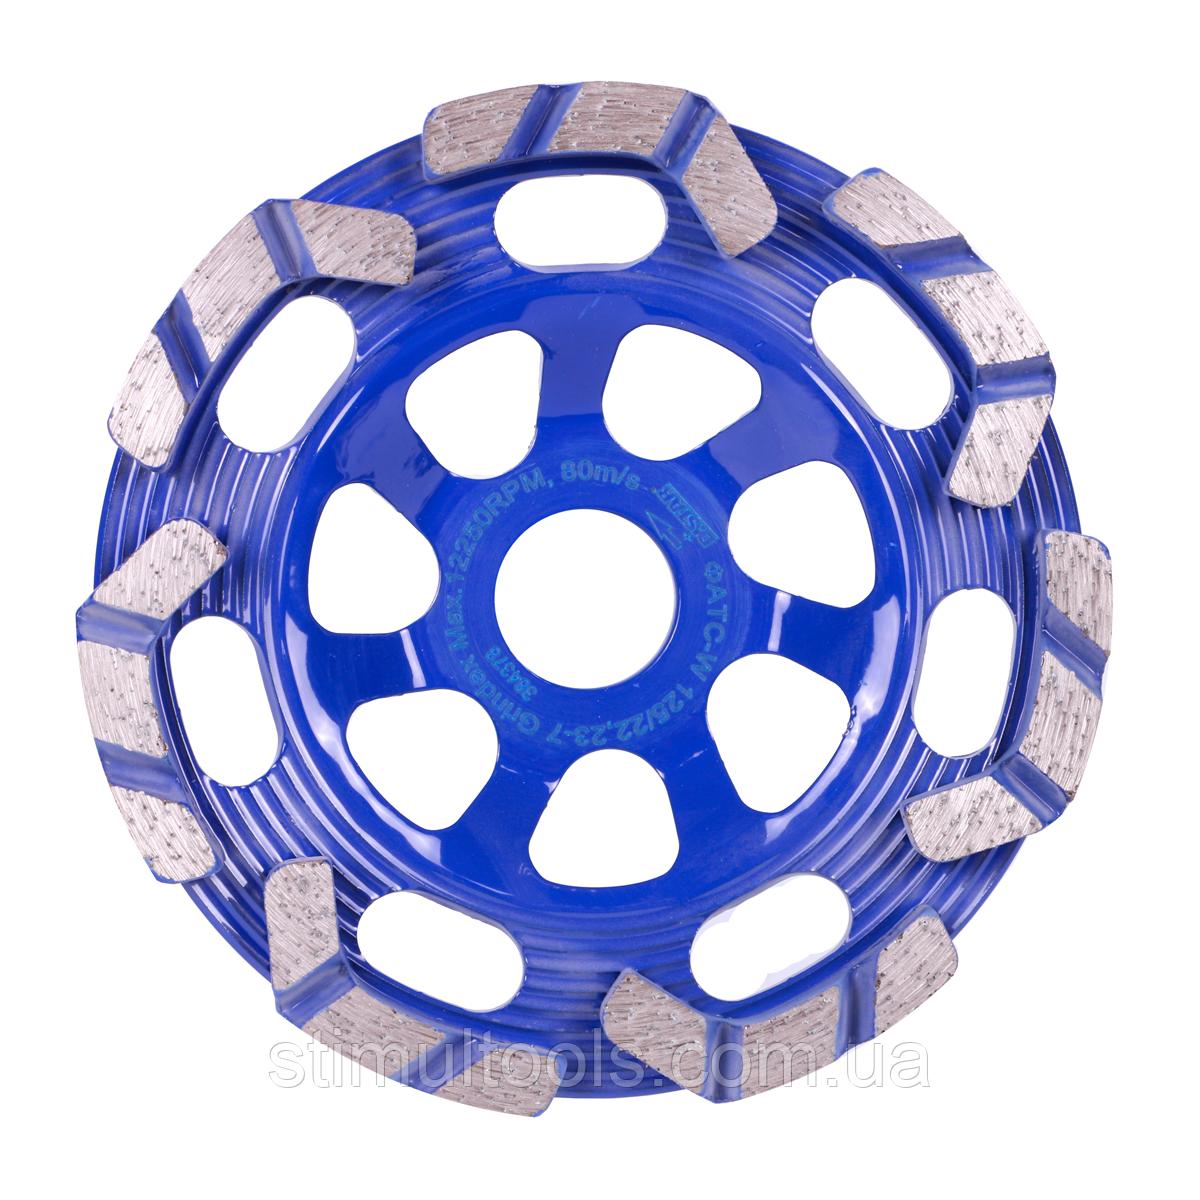 Алмазная чашка Distar DGS-W 125/22,23-7 Grindex